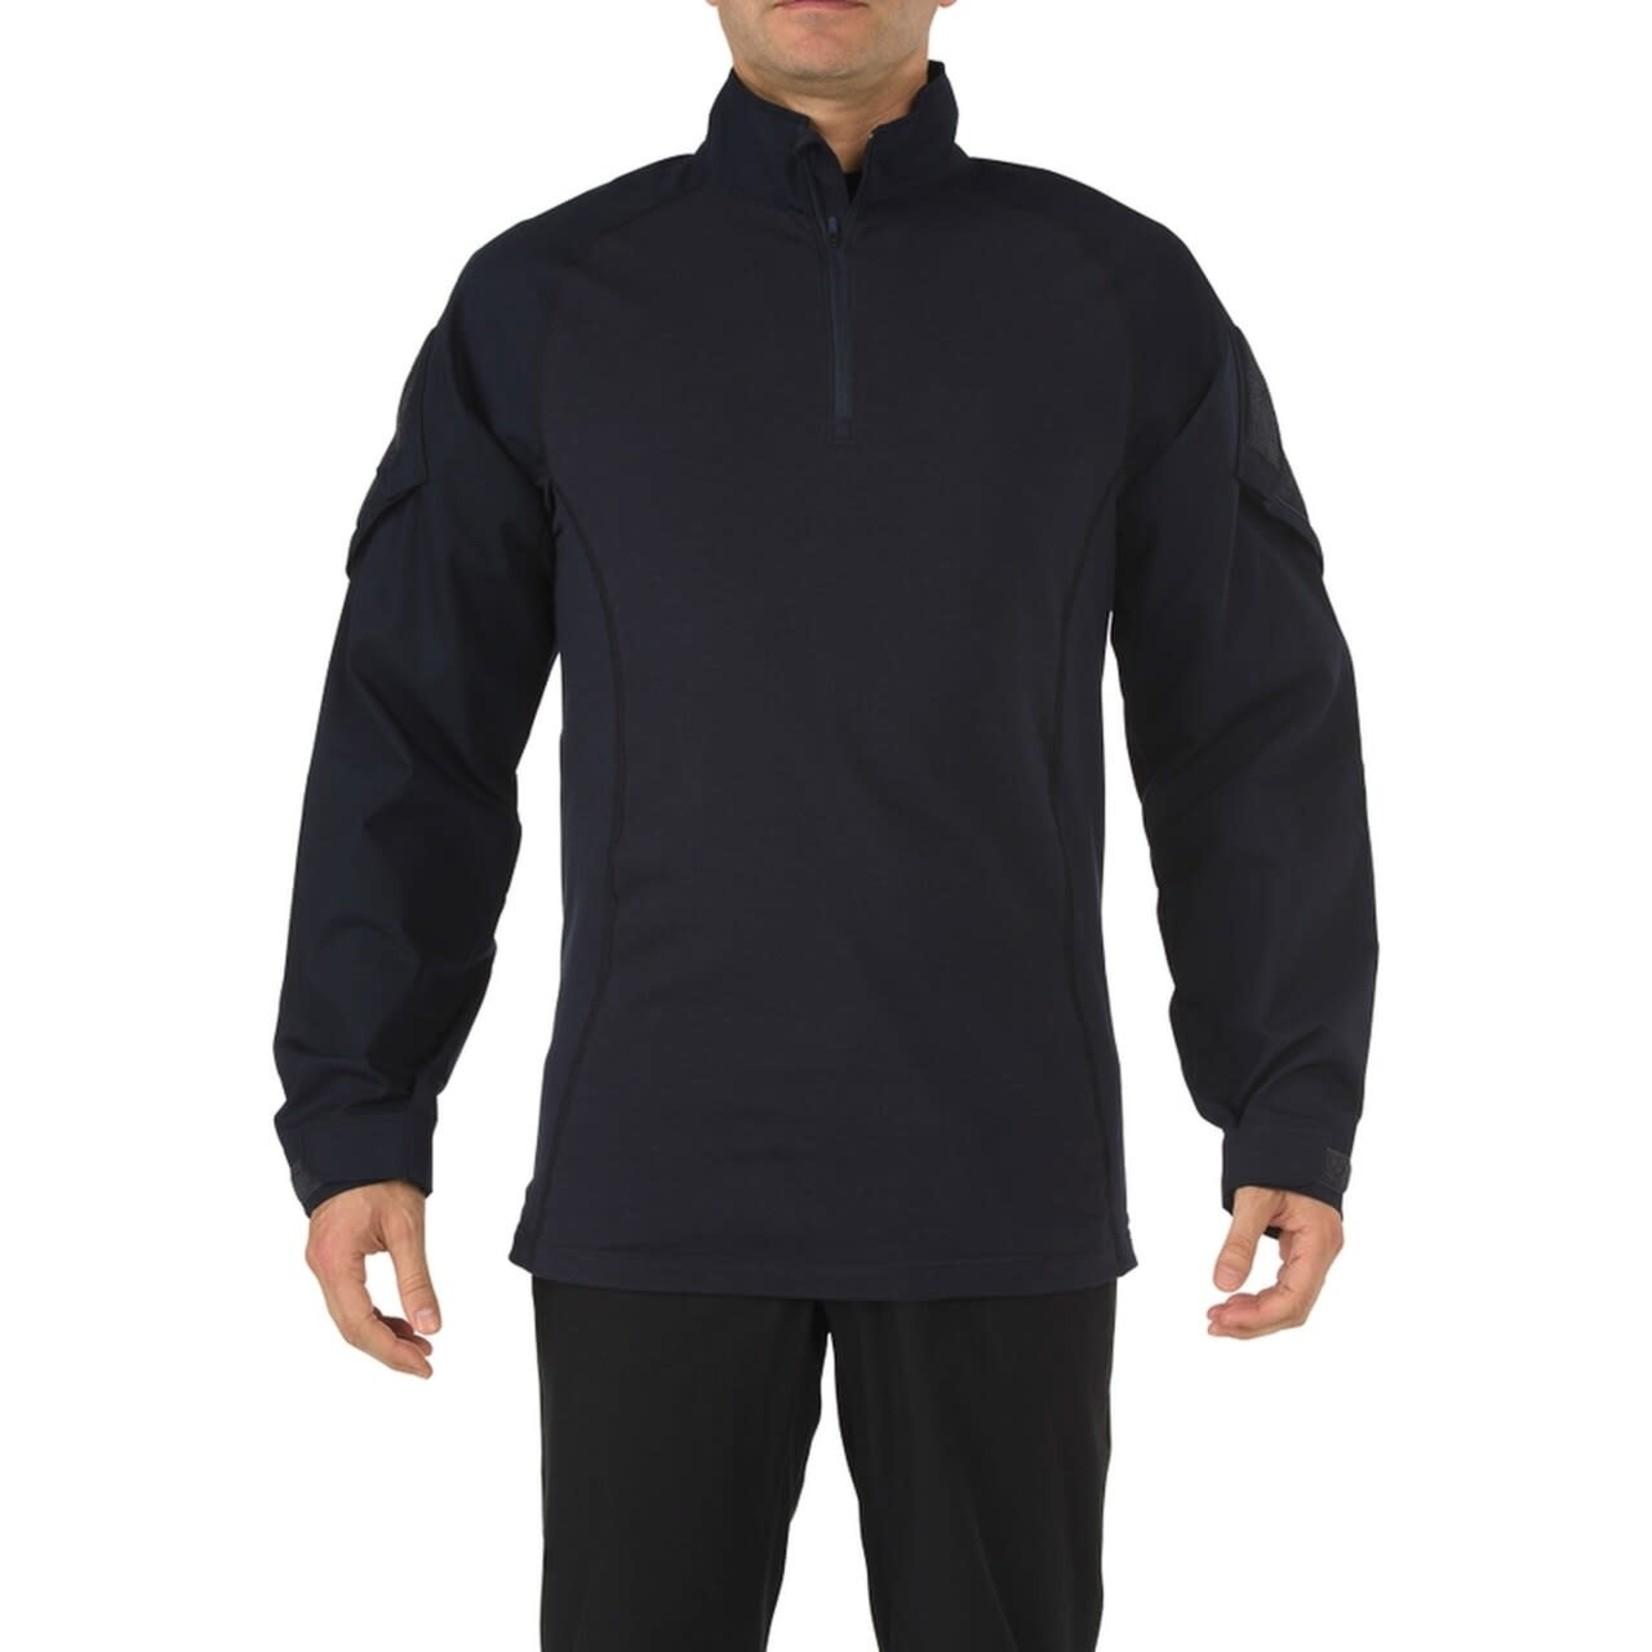 5.11 Tactical 5.11 Rapid Assault Shirt